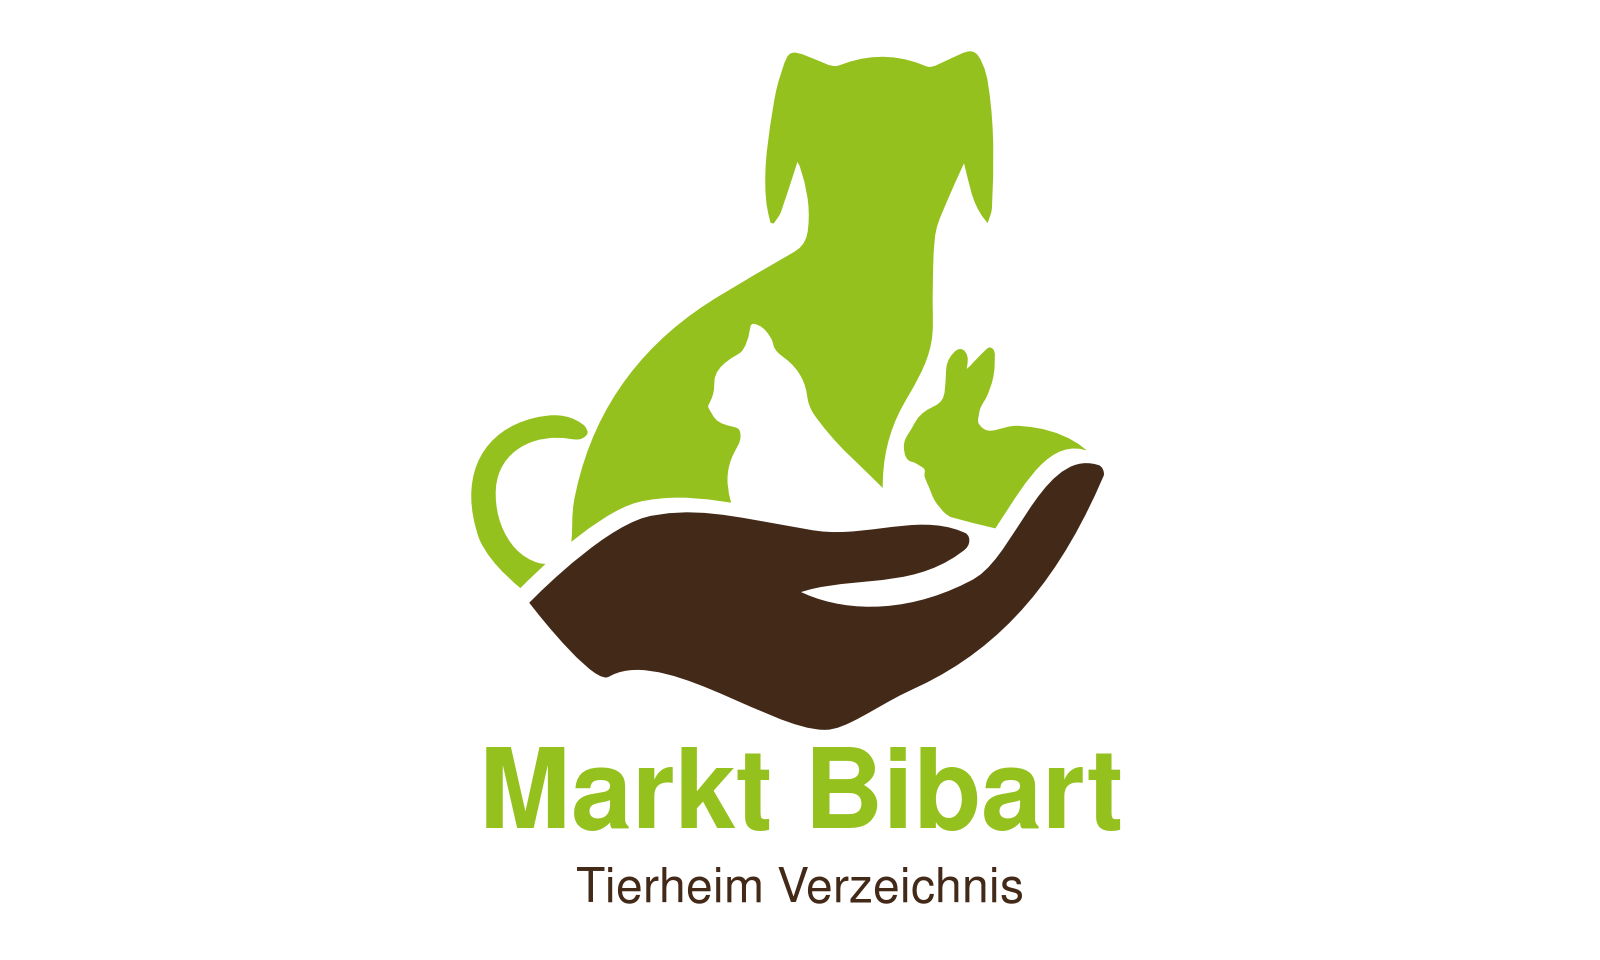 Tierheim Markt Bibart